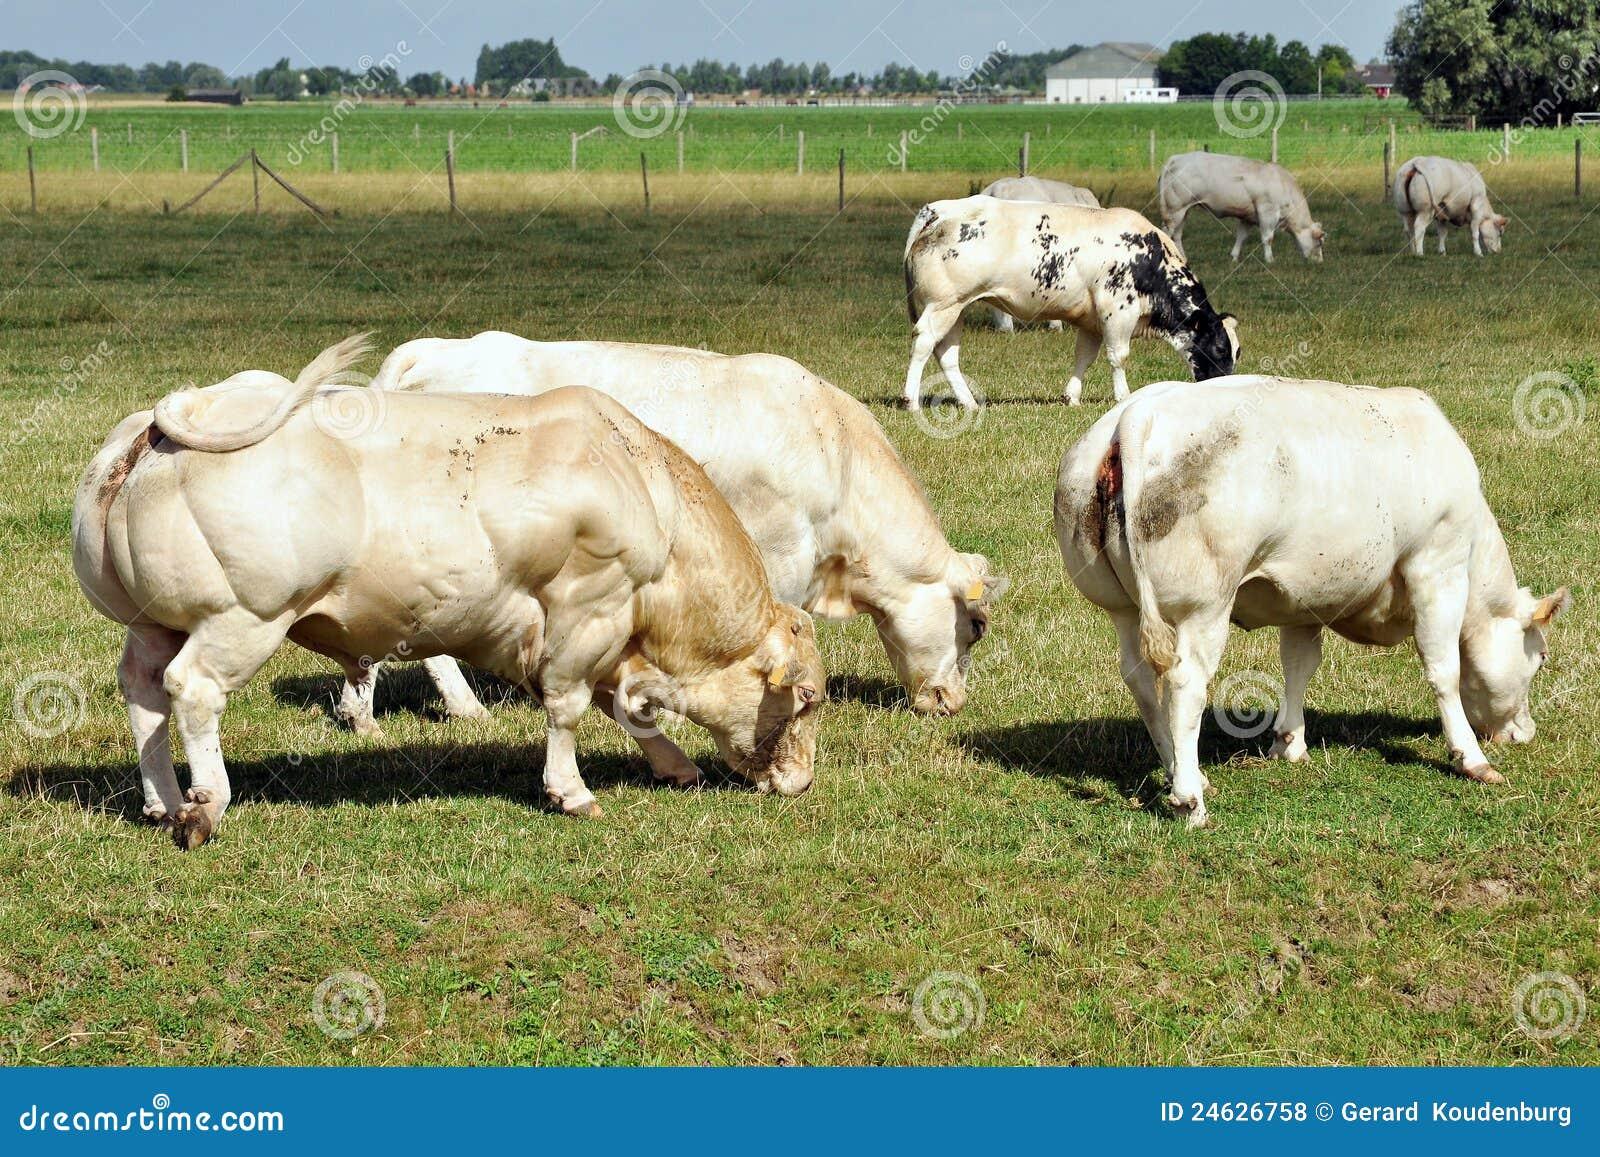 Big Bad Muscular Bull Royalty Free Stock Photos - Image